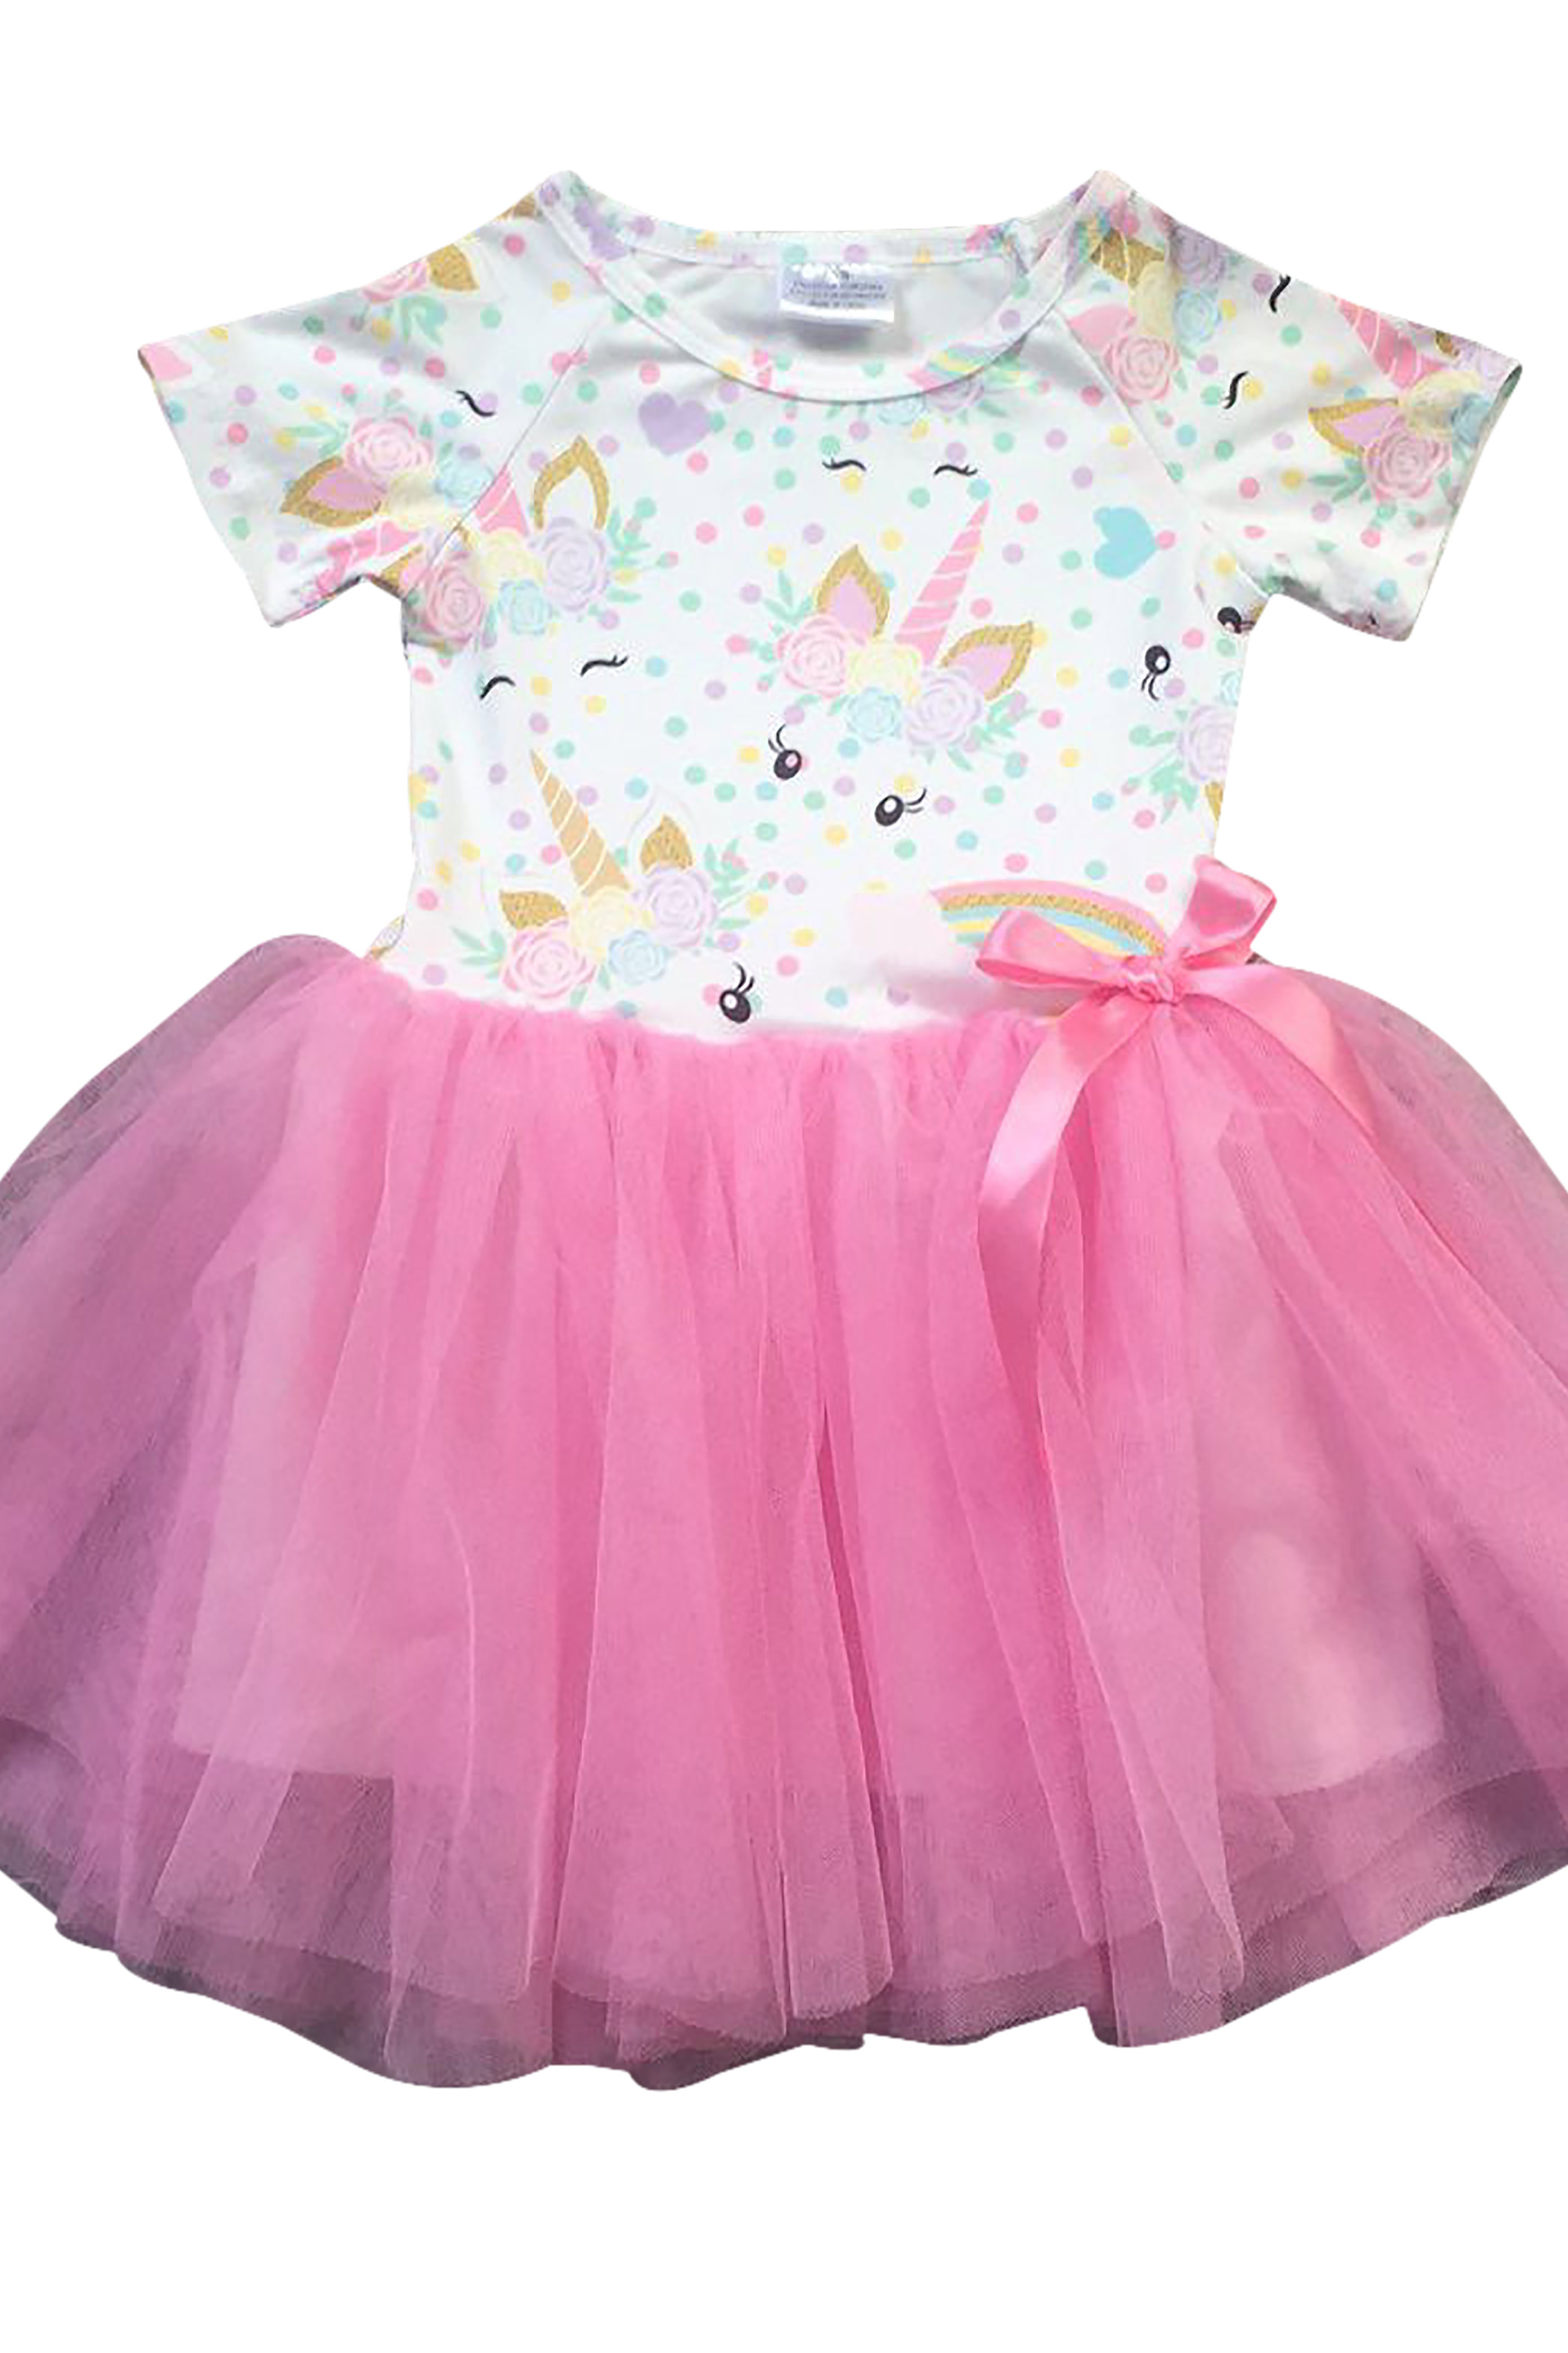 Little Girl Dress Kids Cap Sleeve Unicorn Mesh Summer Flower Girl Dress Pink 2T XS (201422)